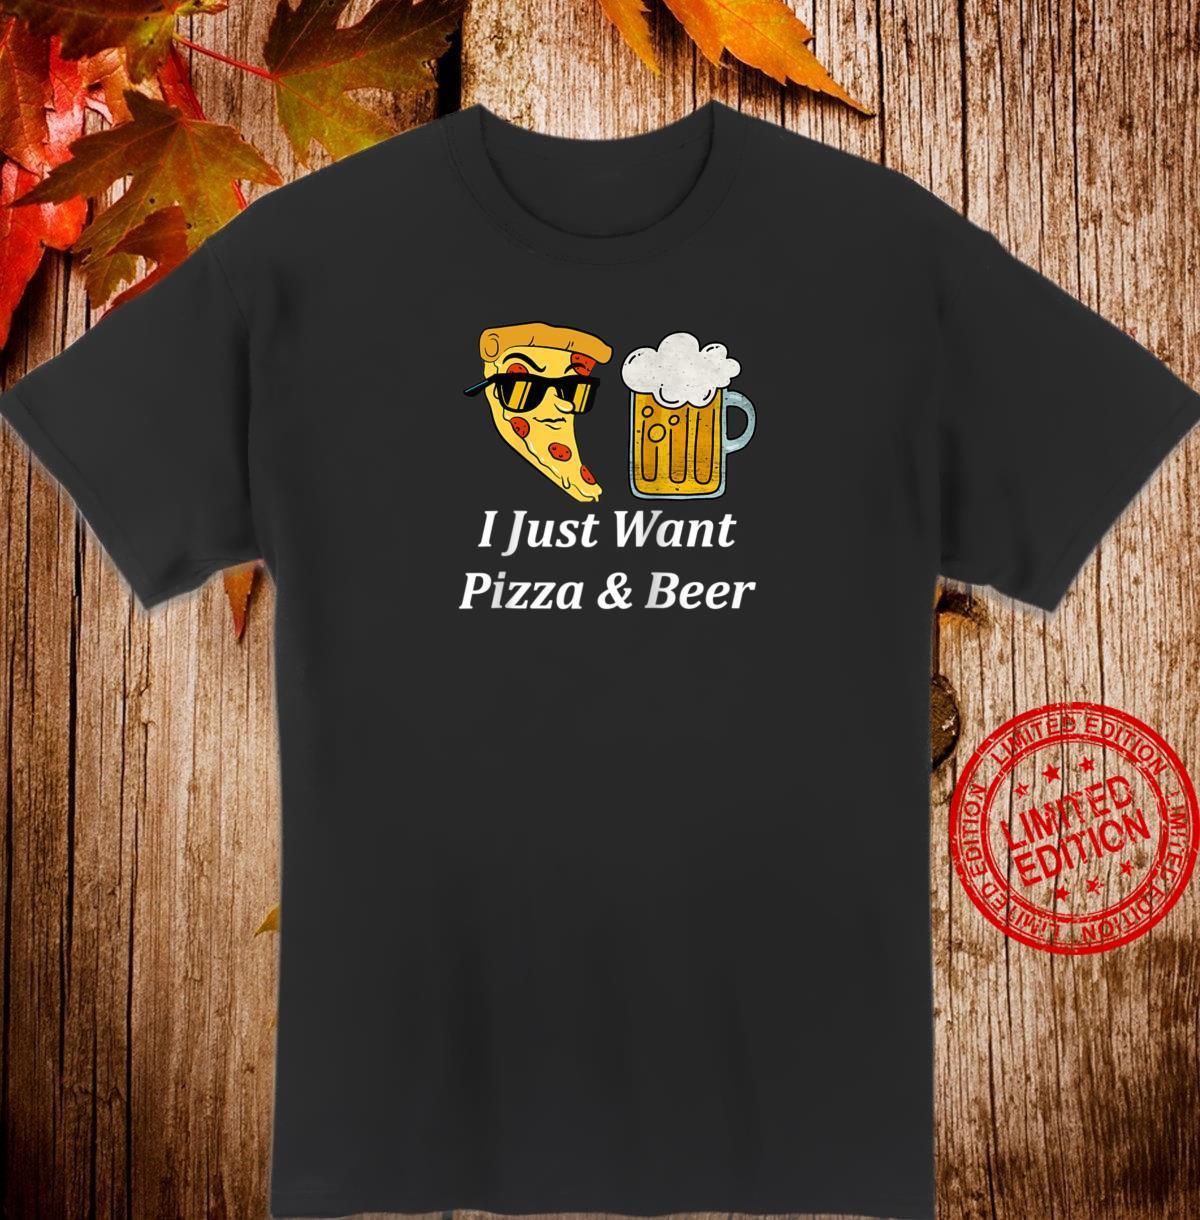 I Just Want Pizza & Beer Shirt